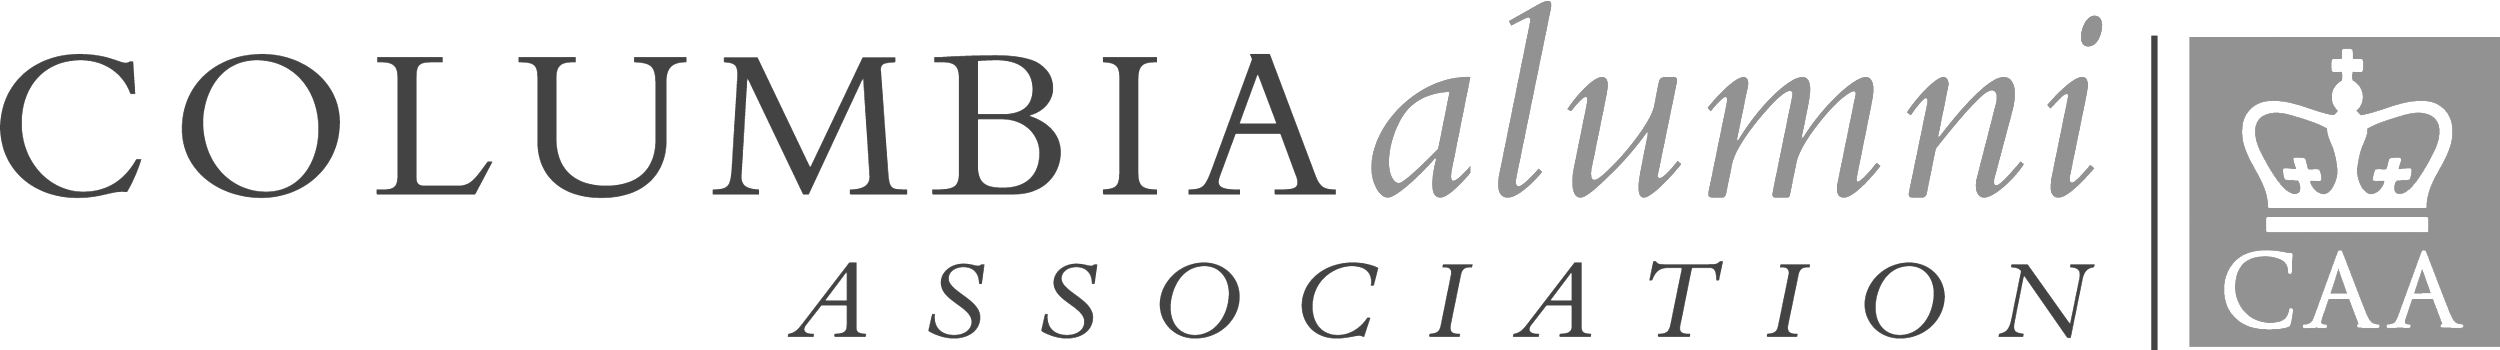 Alumni-Association-Logo-gray.png